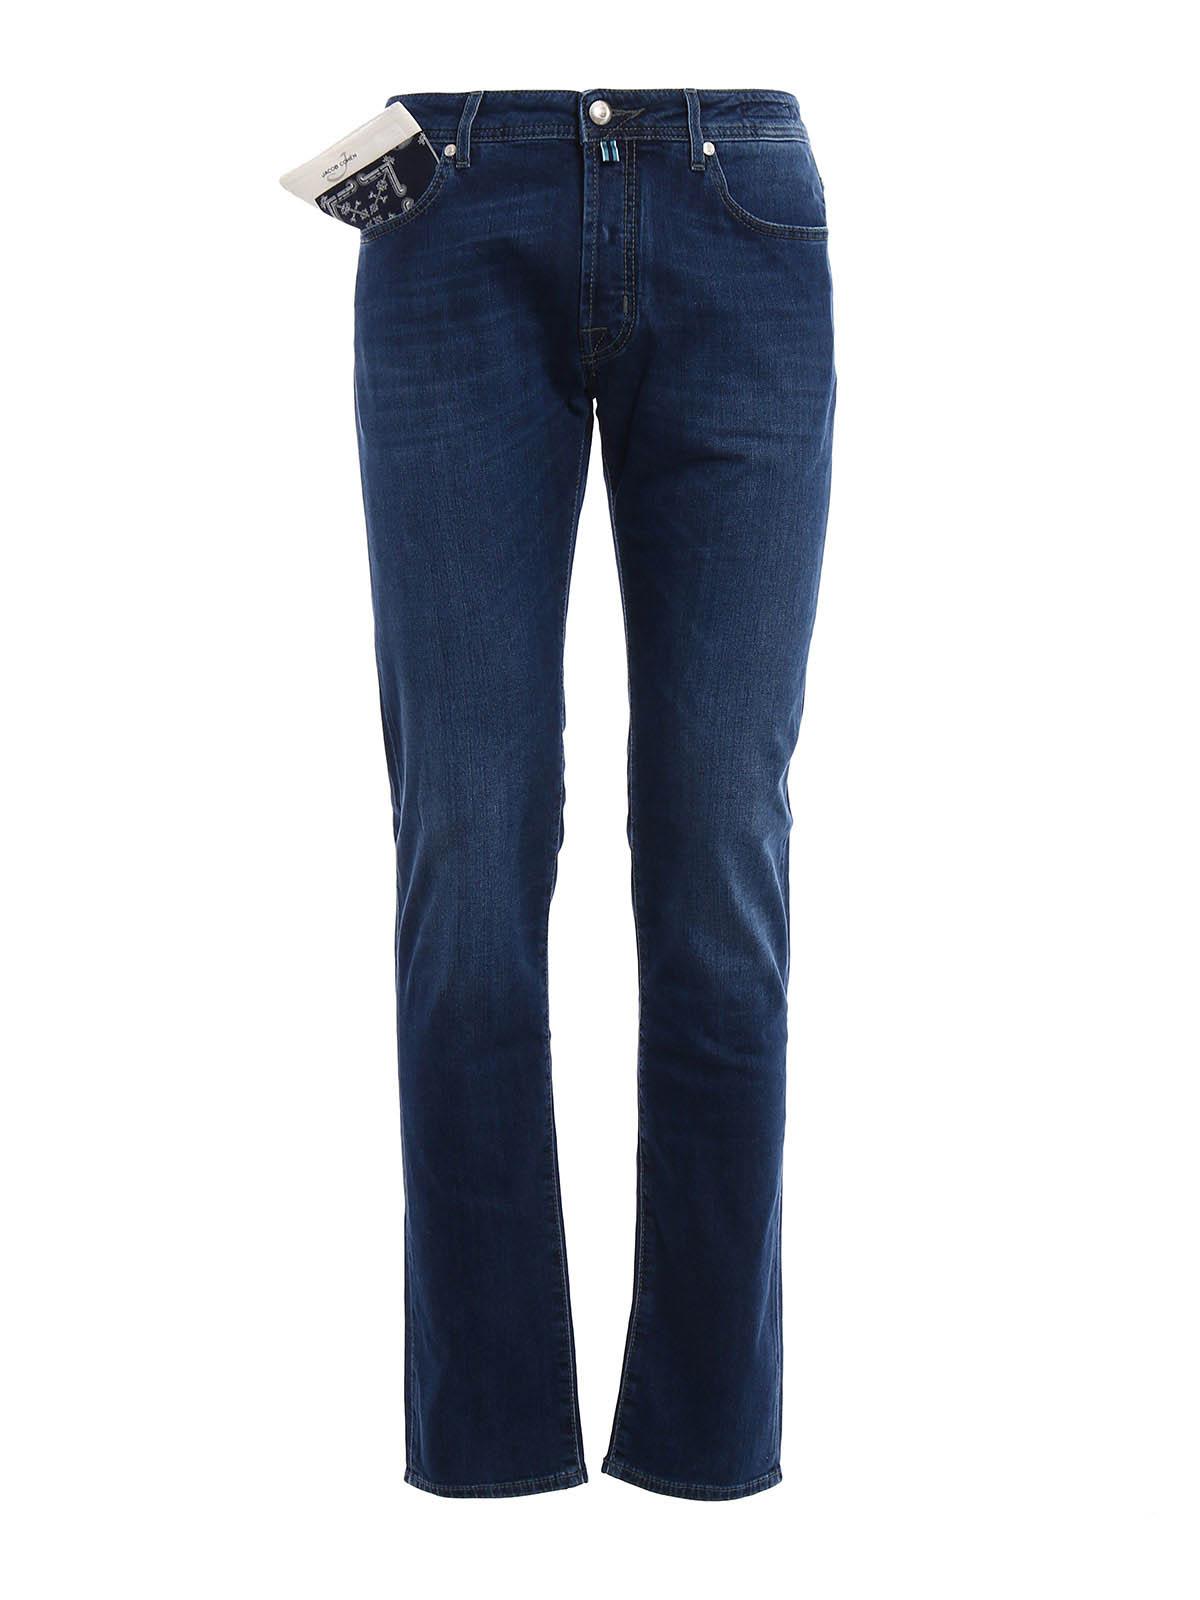 Jacob cohen denim jeans j688 w2 j68806152 botta b - Jacob cohen denim ...